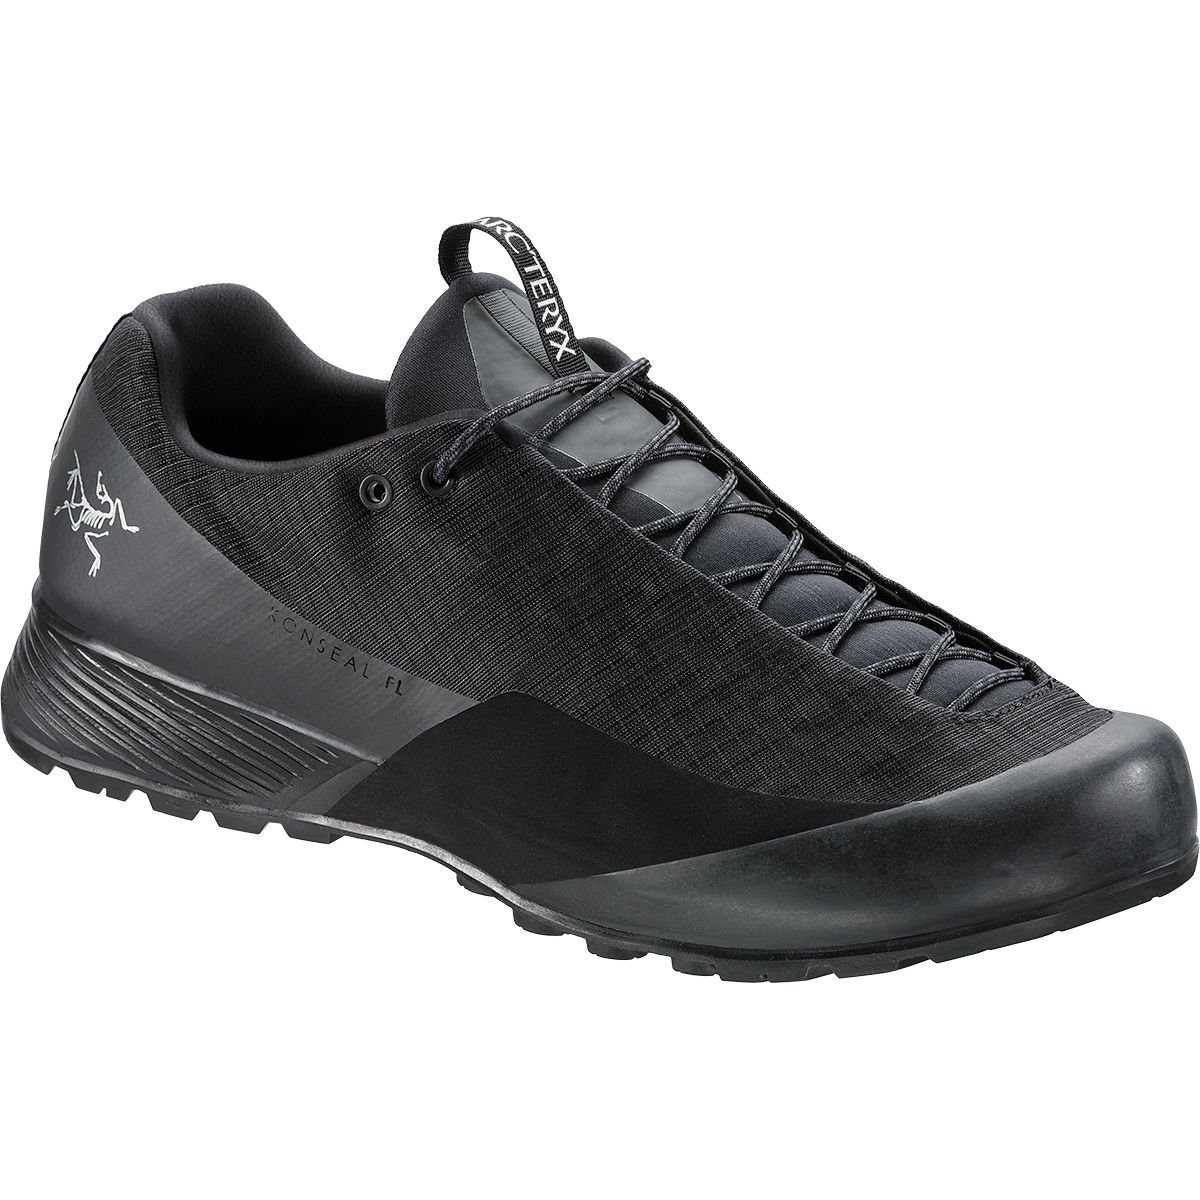 ARC'TERYX(アークテリクス) Konseal FL Shoe Men's コンシール FL シューズ メンズ 22247 B071JN71C4 26.5 cm ブラック/パイロット ブラック/パイロット 26.5 cm